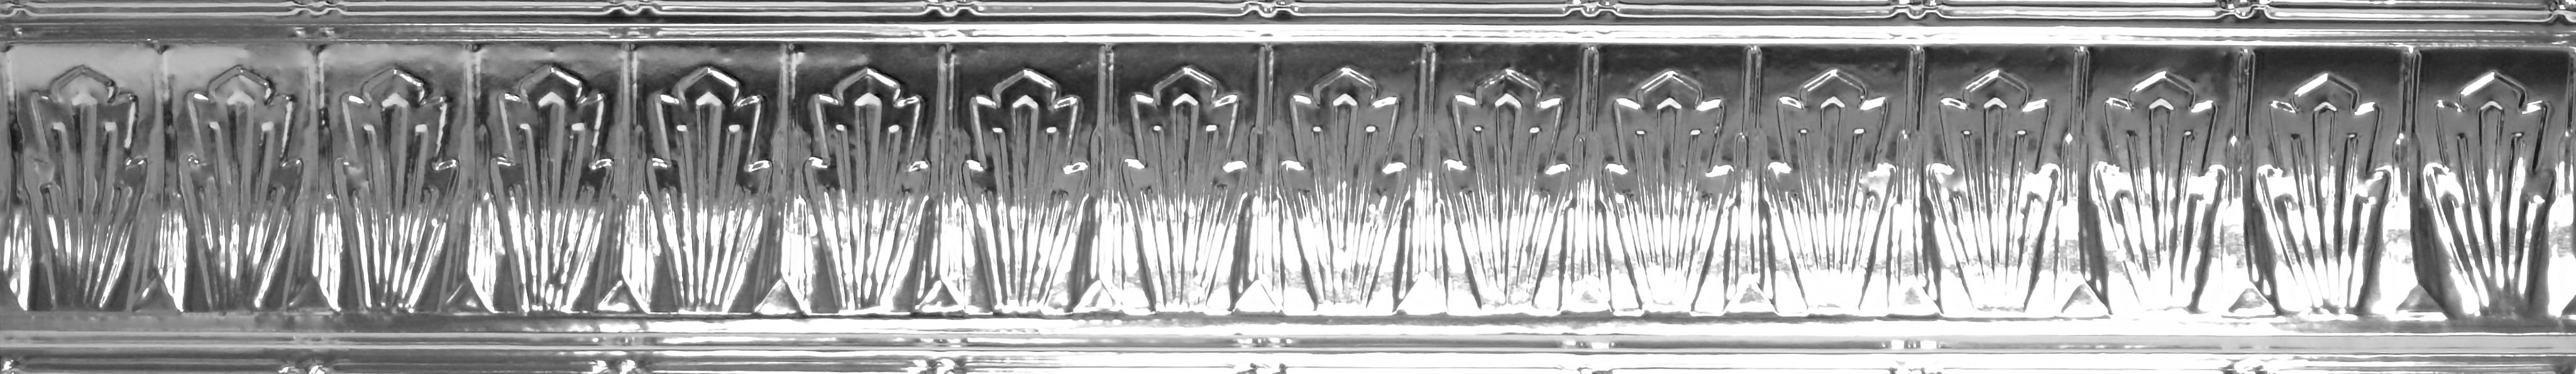 Deco Crowns - Shanko Tin Cornice - #905